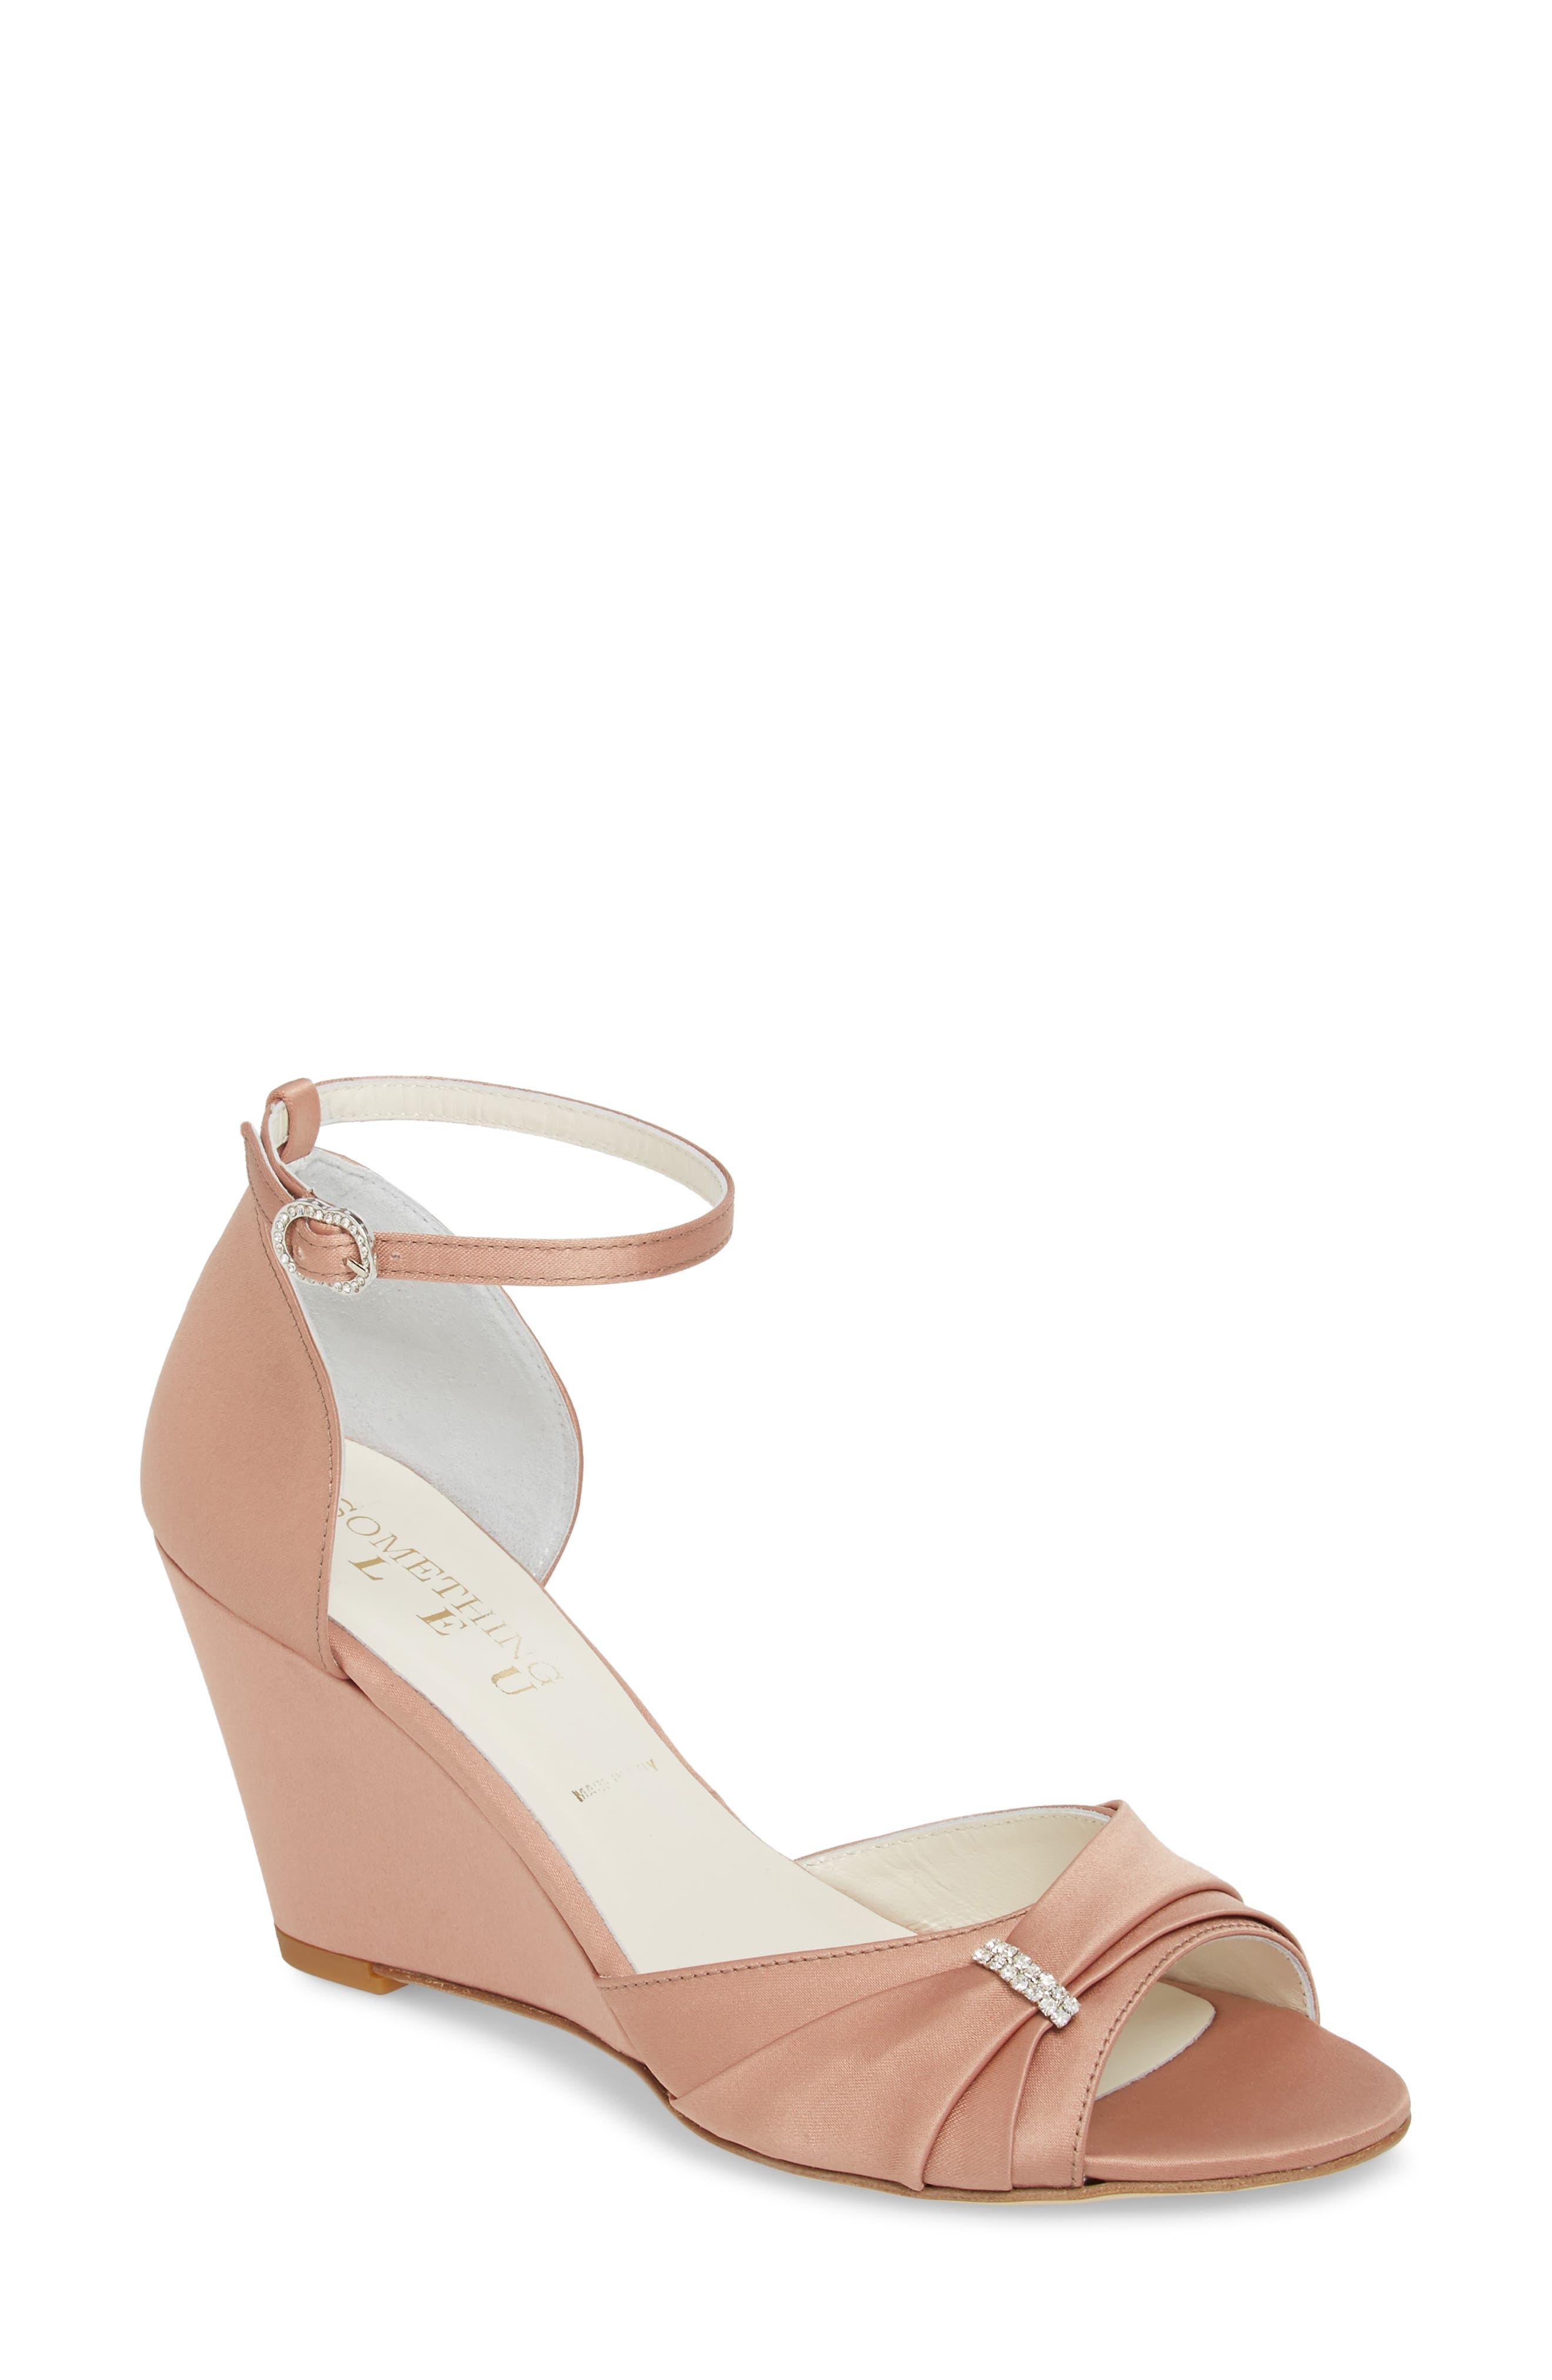 Queenie Ankle Strap Wedge Sandal,                             Main thumbnail 1, color,                             Blush Satin